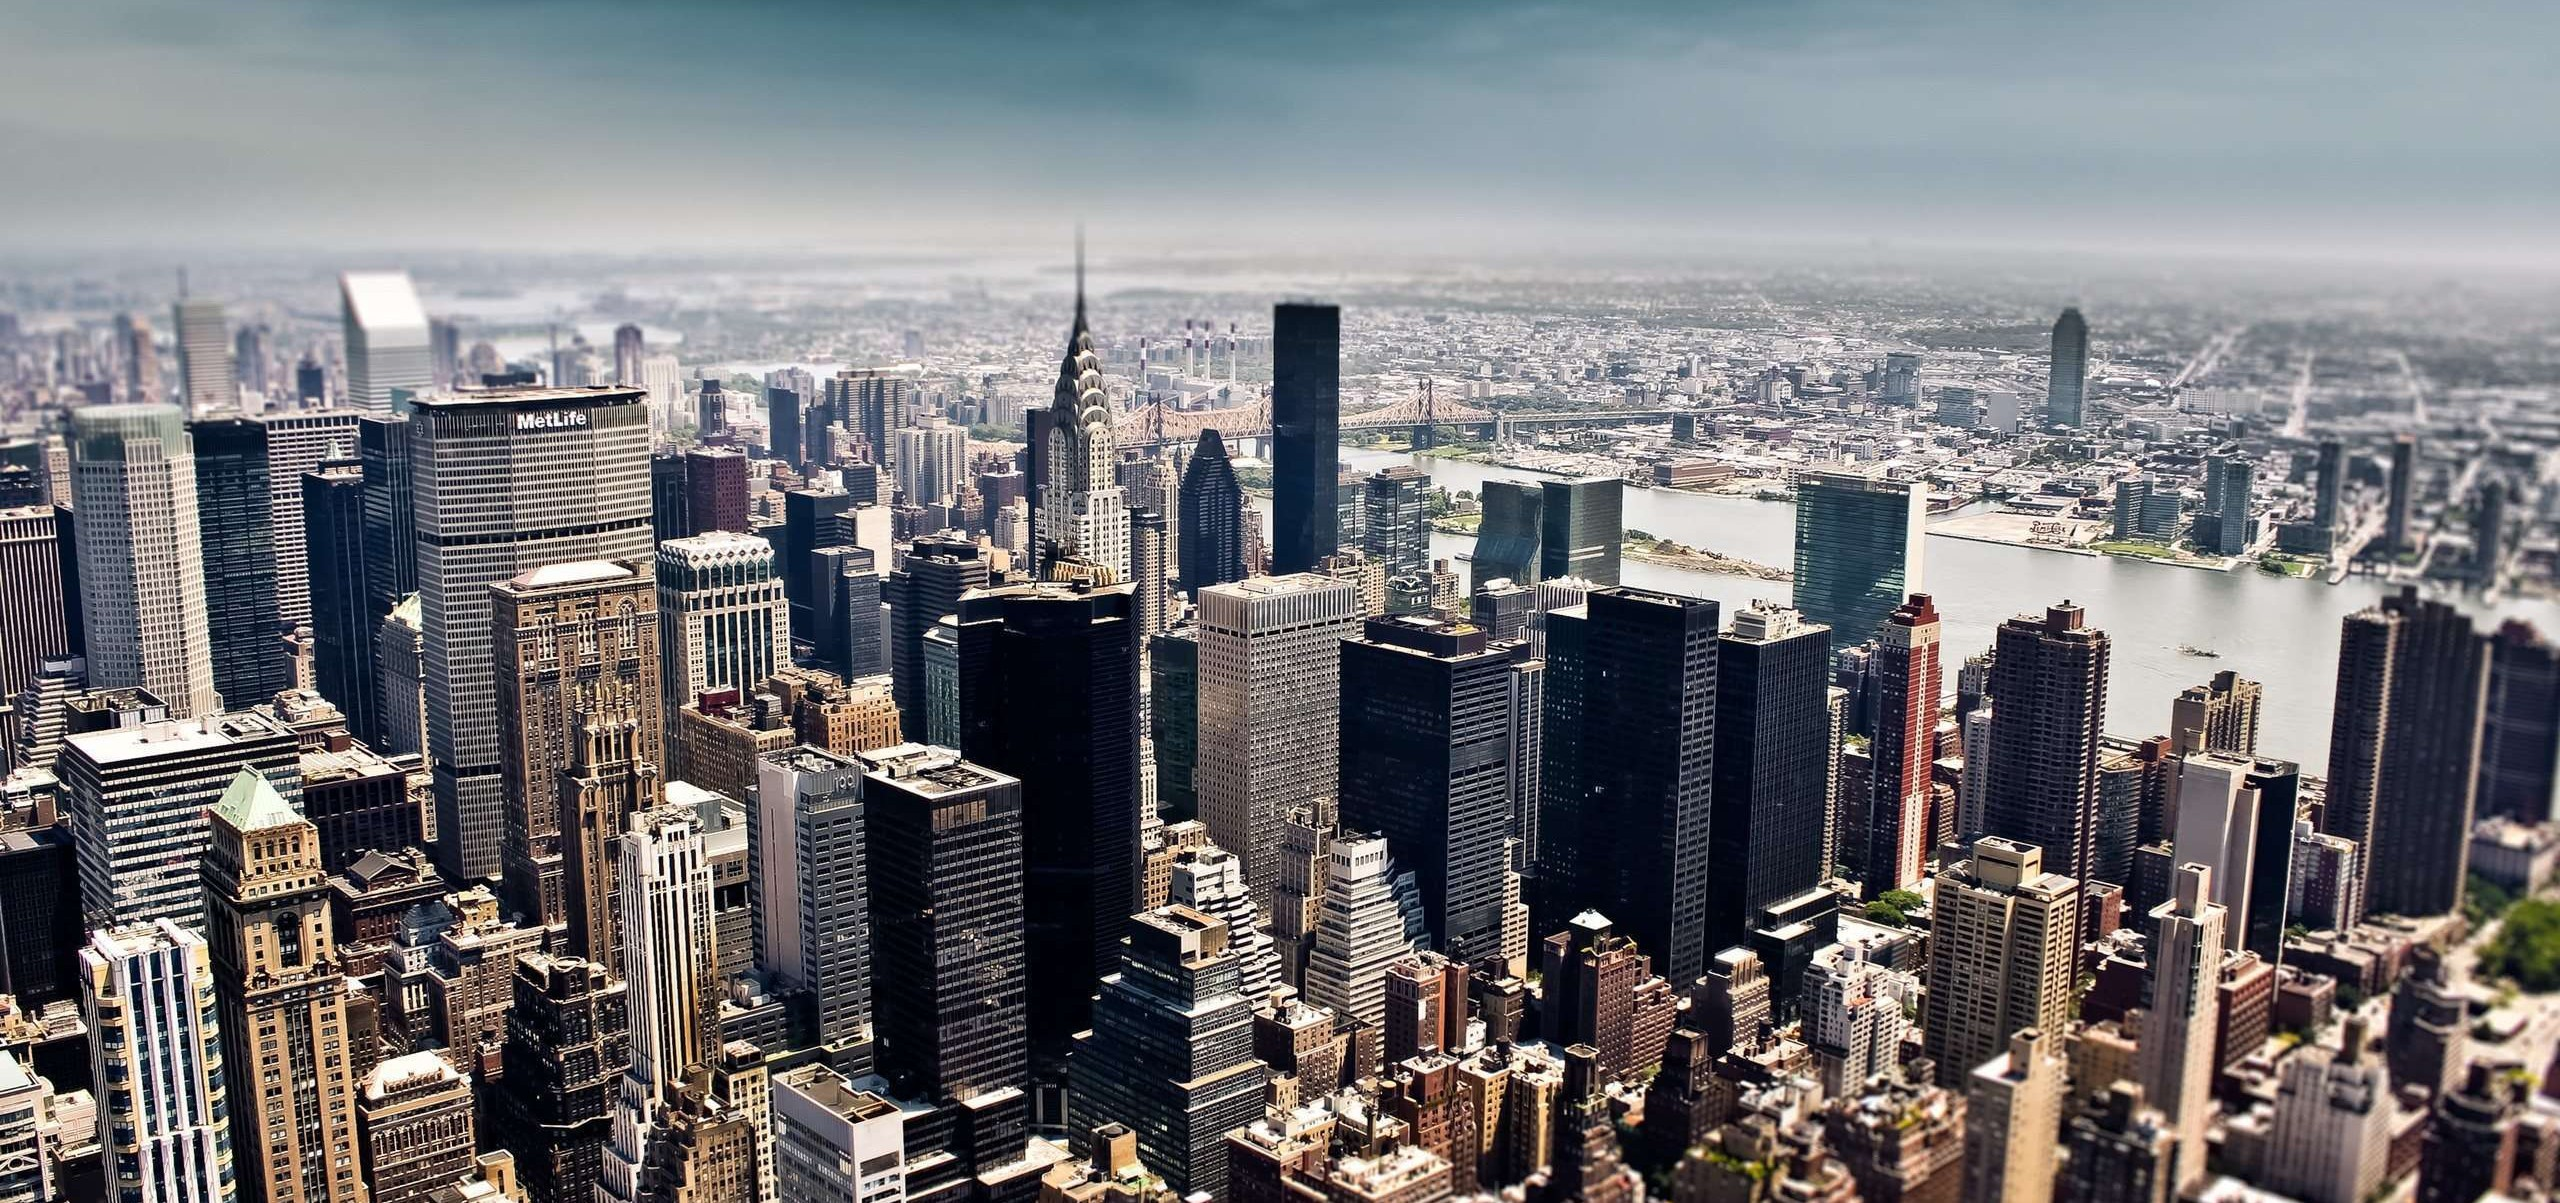 New-York-Scenery-Wallpaper-Widescreen-Wallpaper